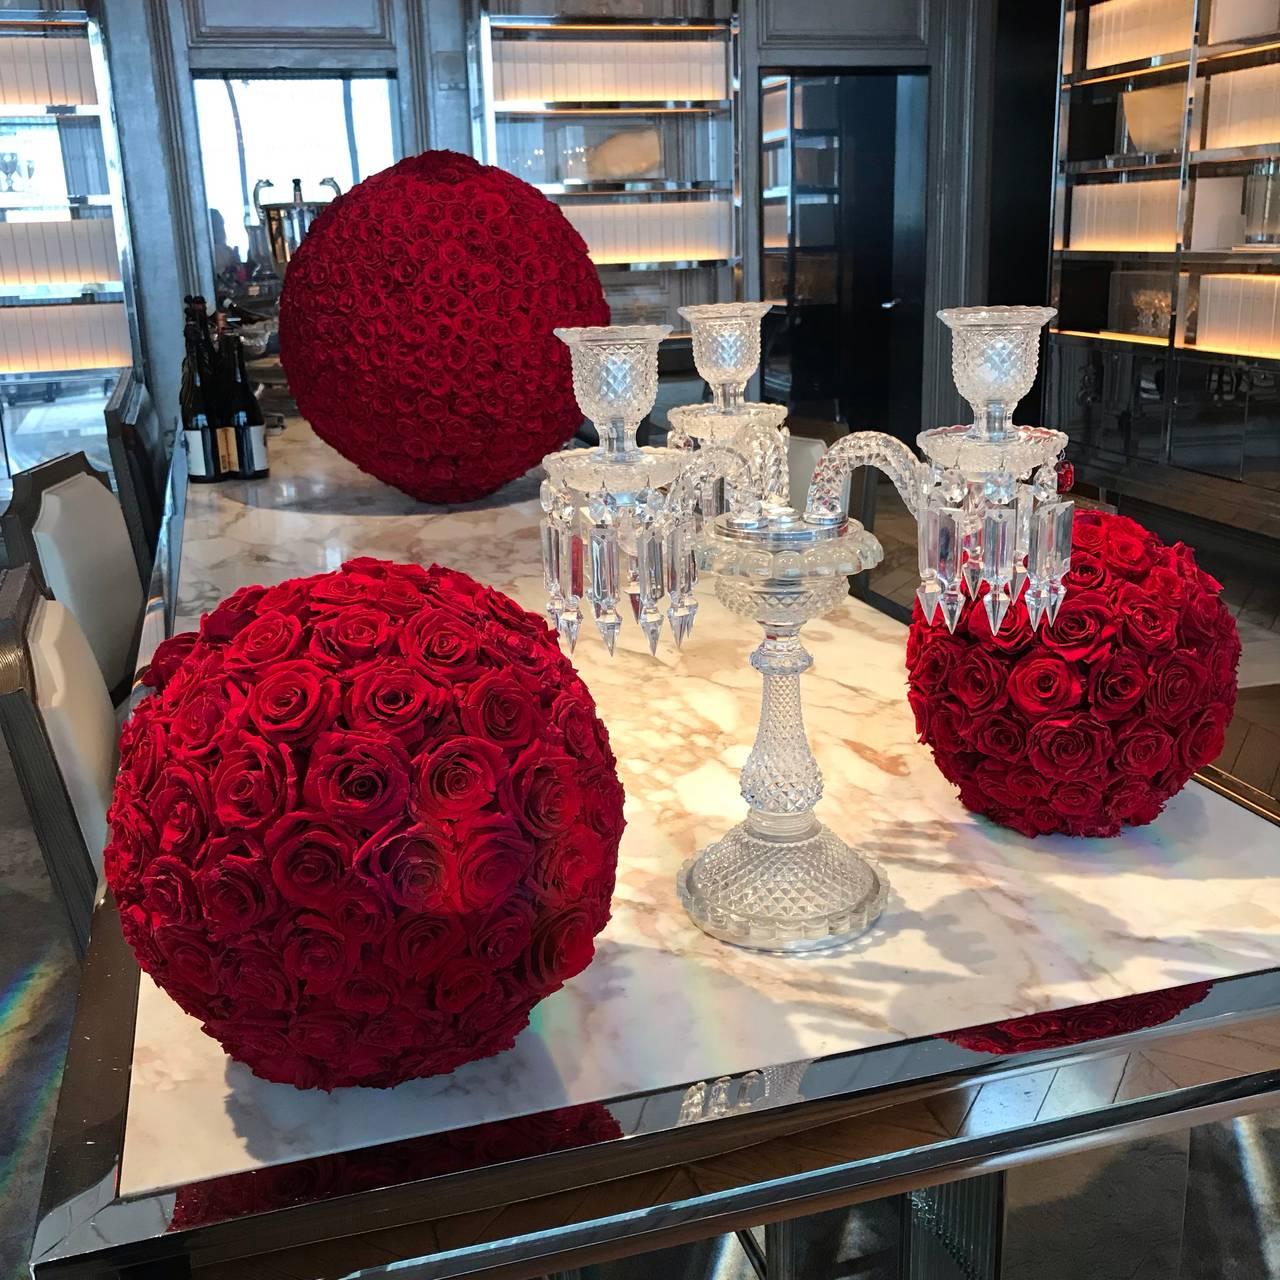 Baguette En Bois Decorative grand salon & bar at baccarat hotel new york restaurant